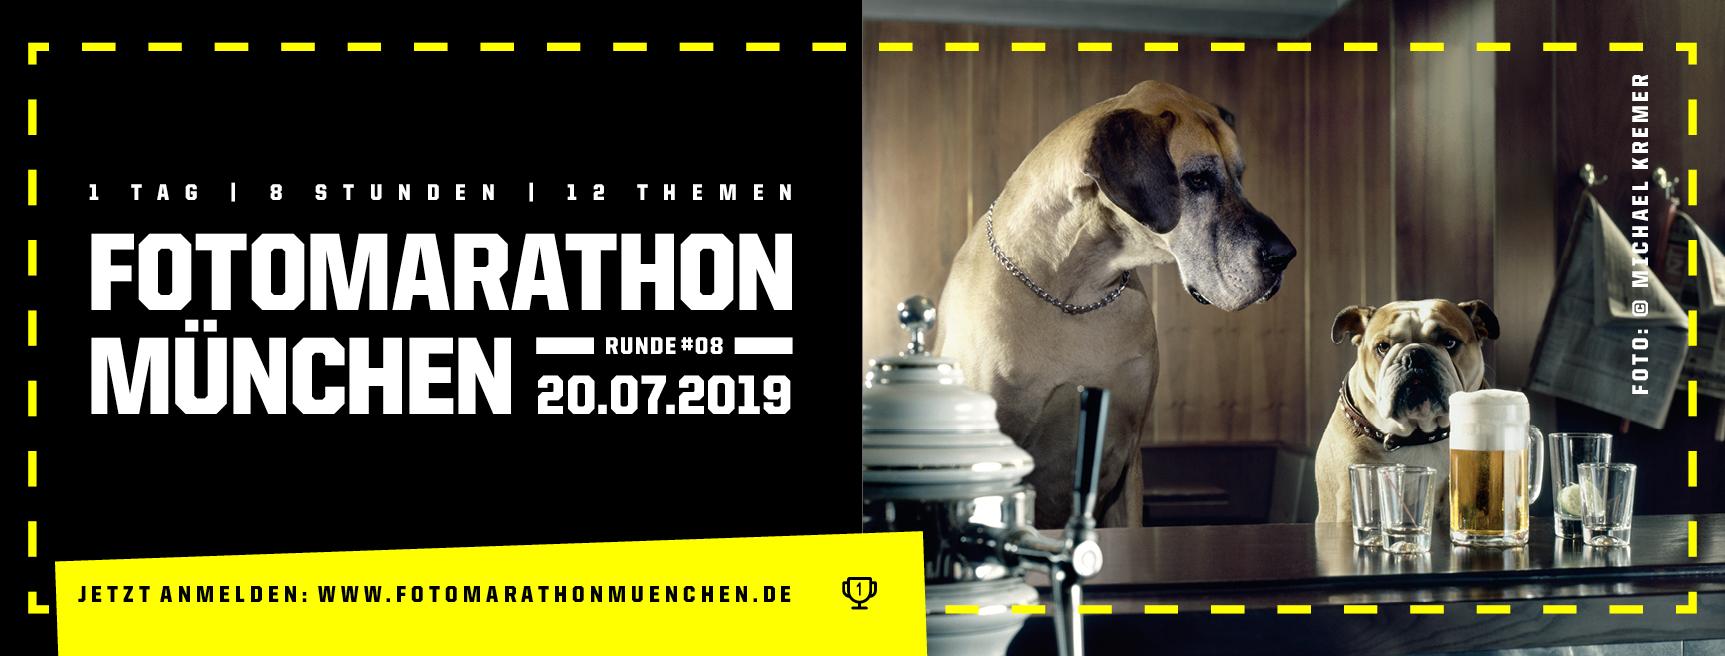 Anmeldung Fotomarathon 2019